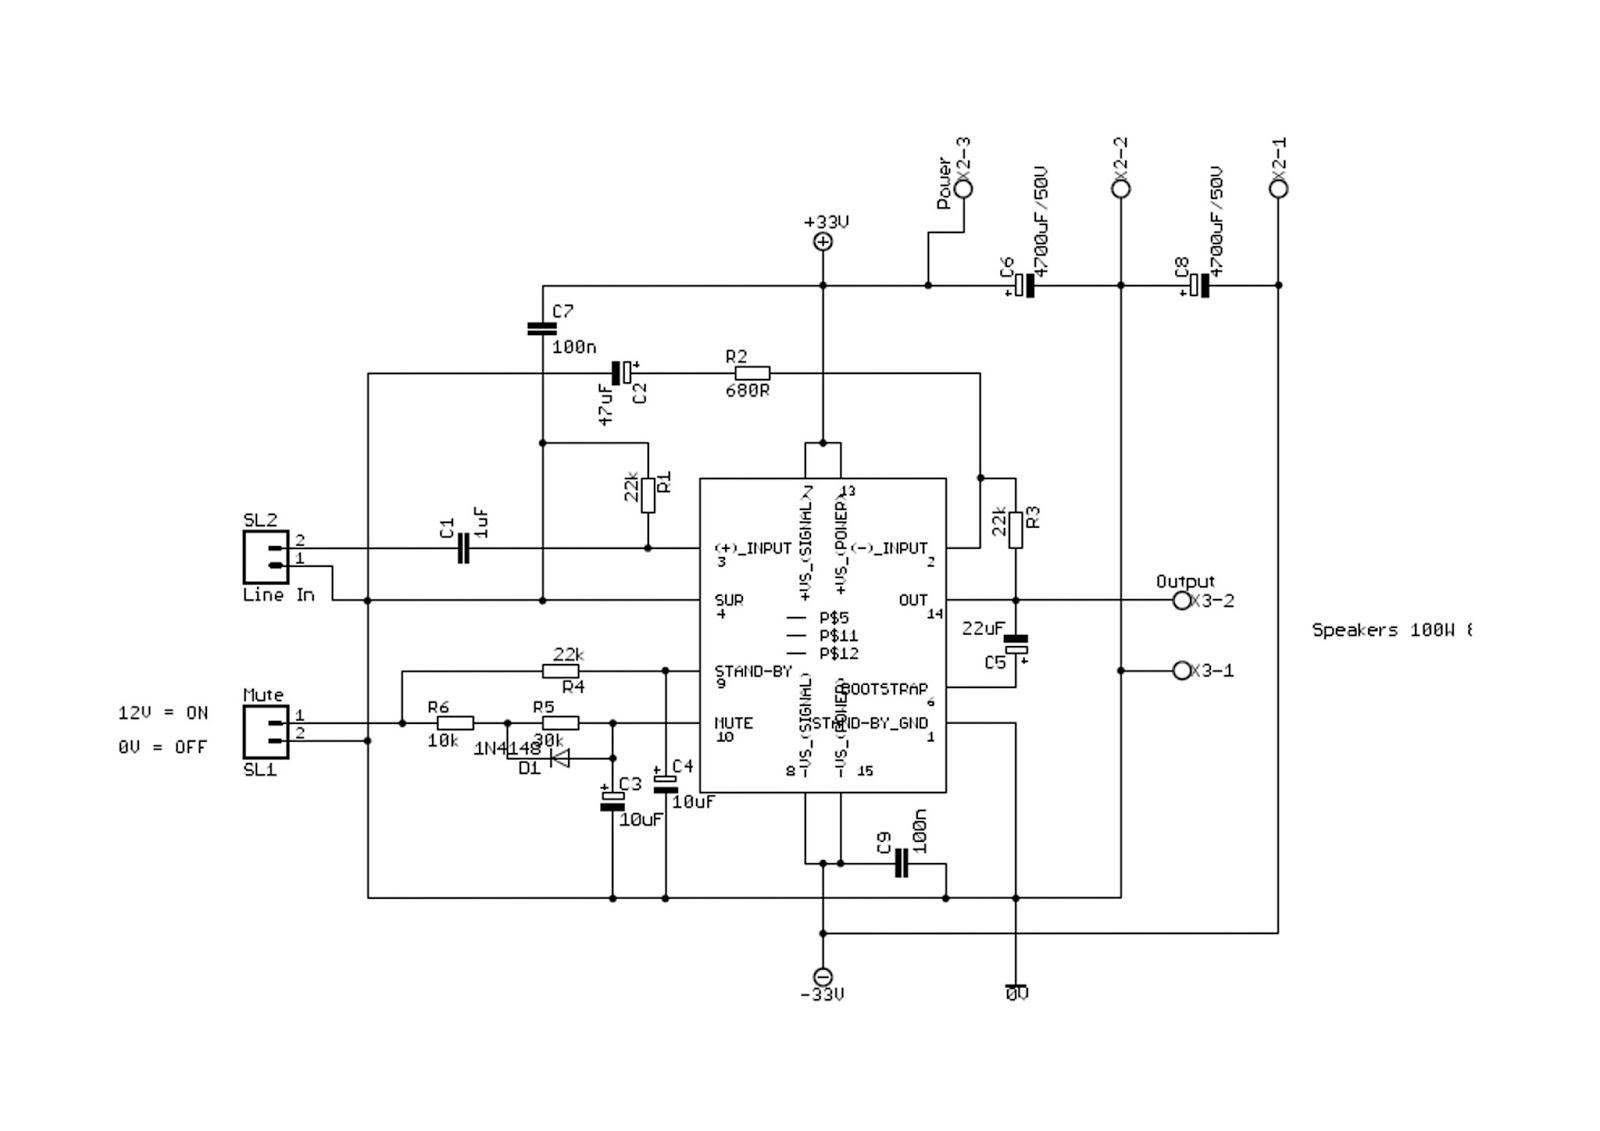 generac 5500 watt generator wiring diagram project expo.: 100 watt audio amplifier